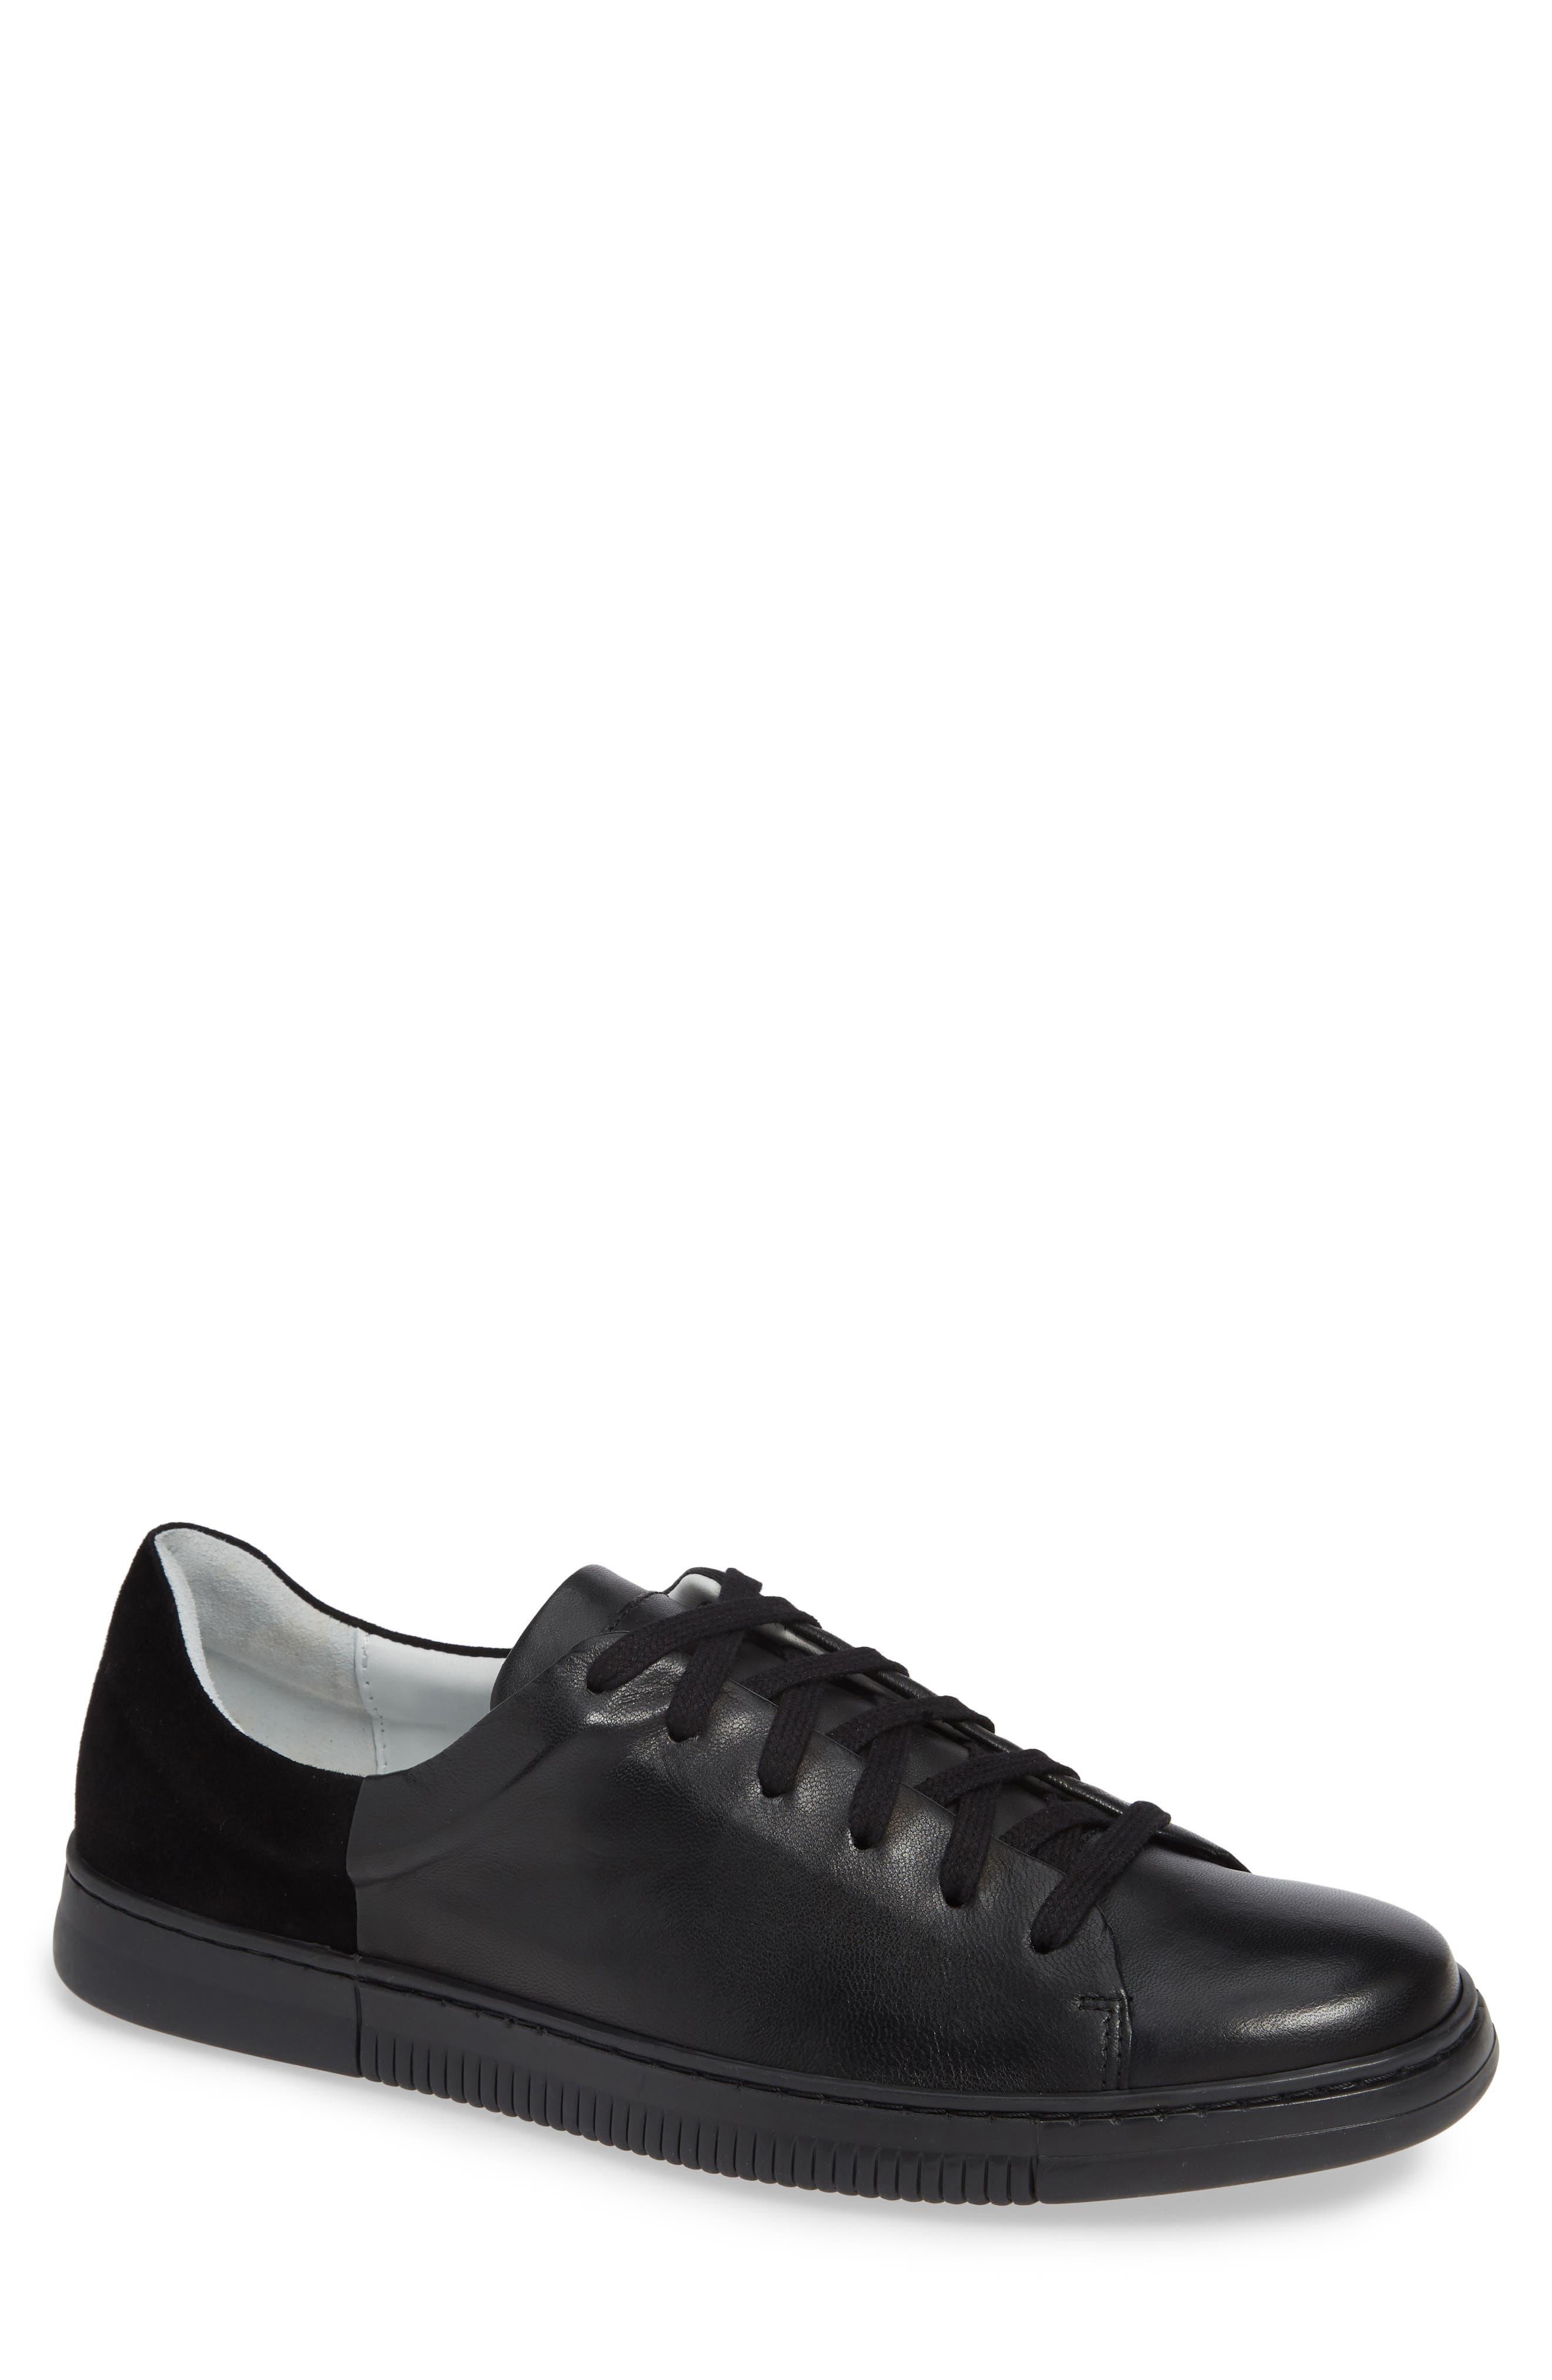 VINCE CAMUTO,                             Jito Sneaker,                             Main thumbnail 1, color,                             BLACK LEATHER